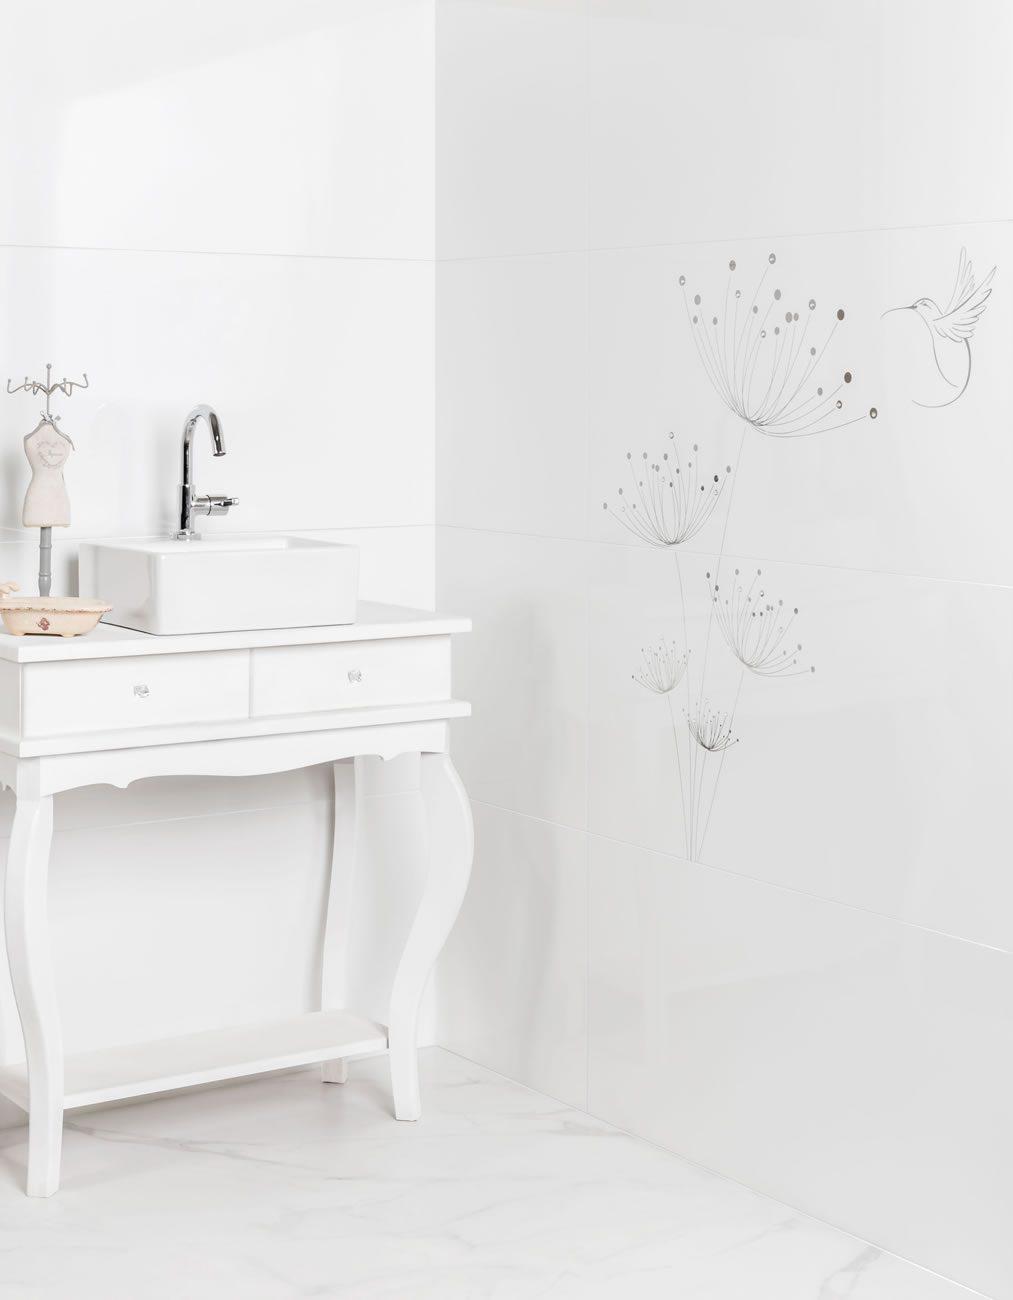 environment Eliane: kit-colibri-br-45x90cm_diamante-branco-br-45x90cm_calacata-po-80x80cm-amb-02